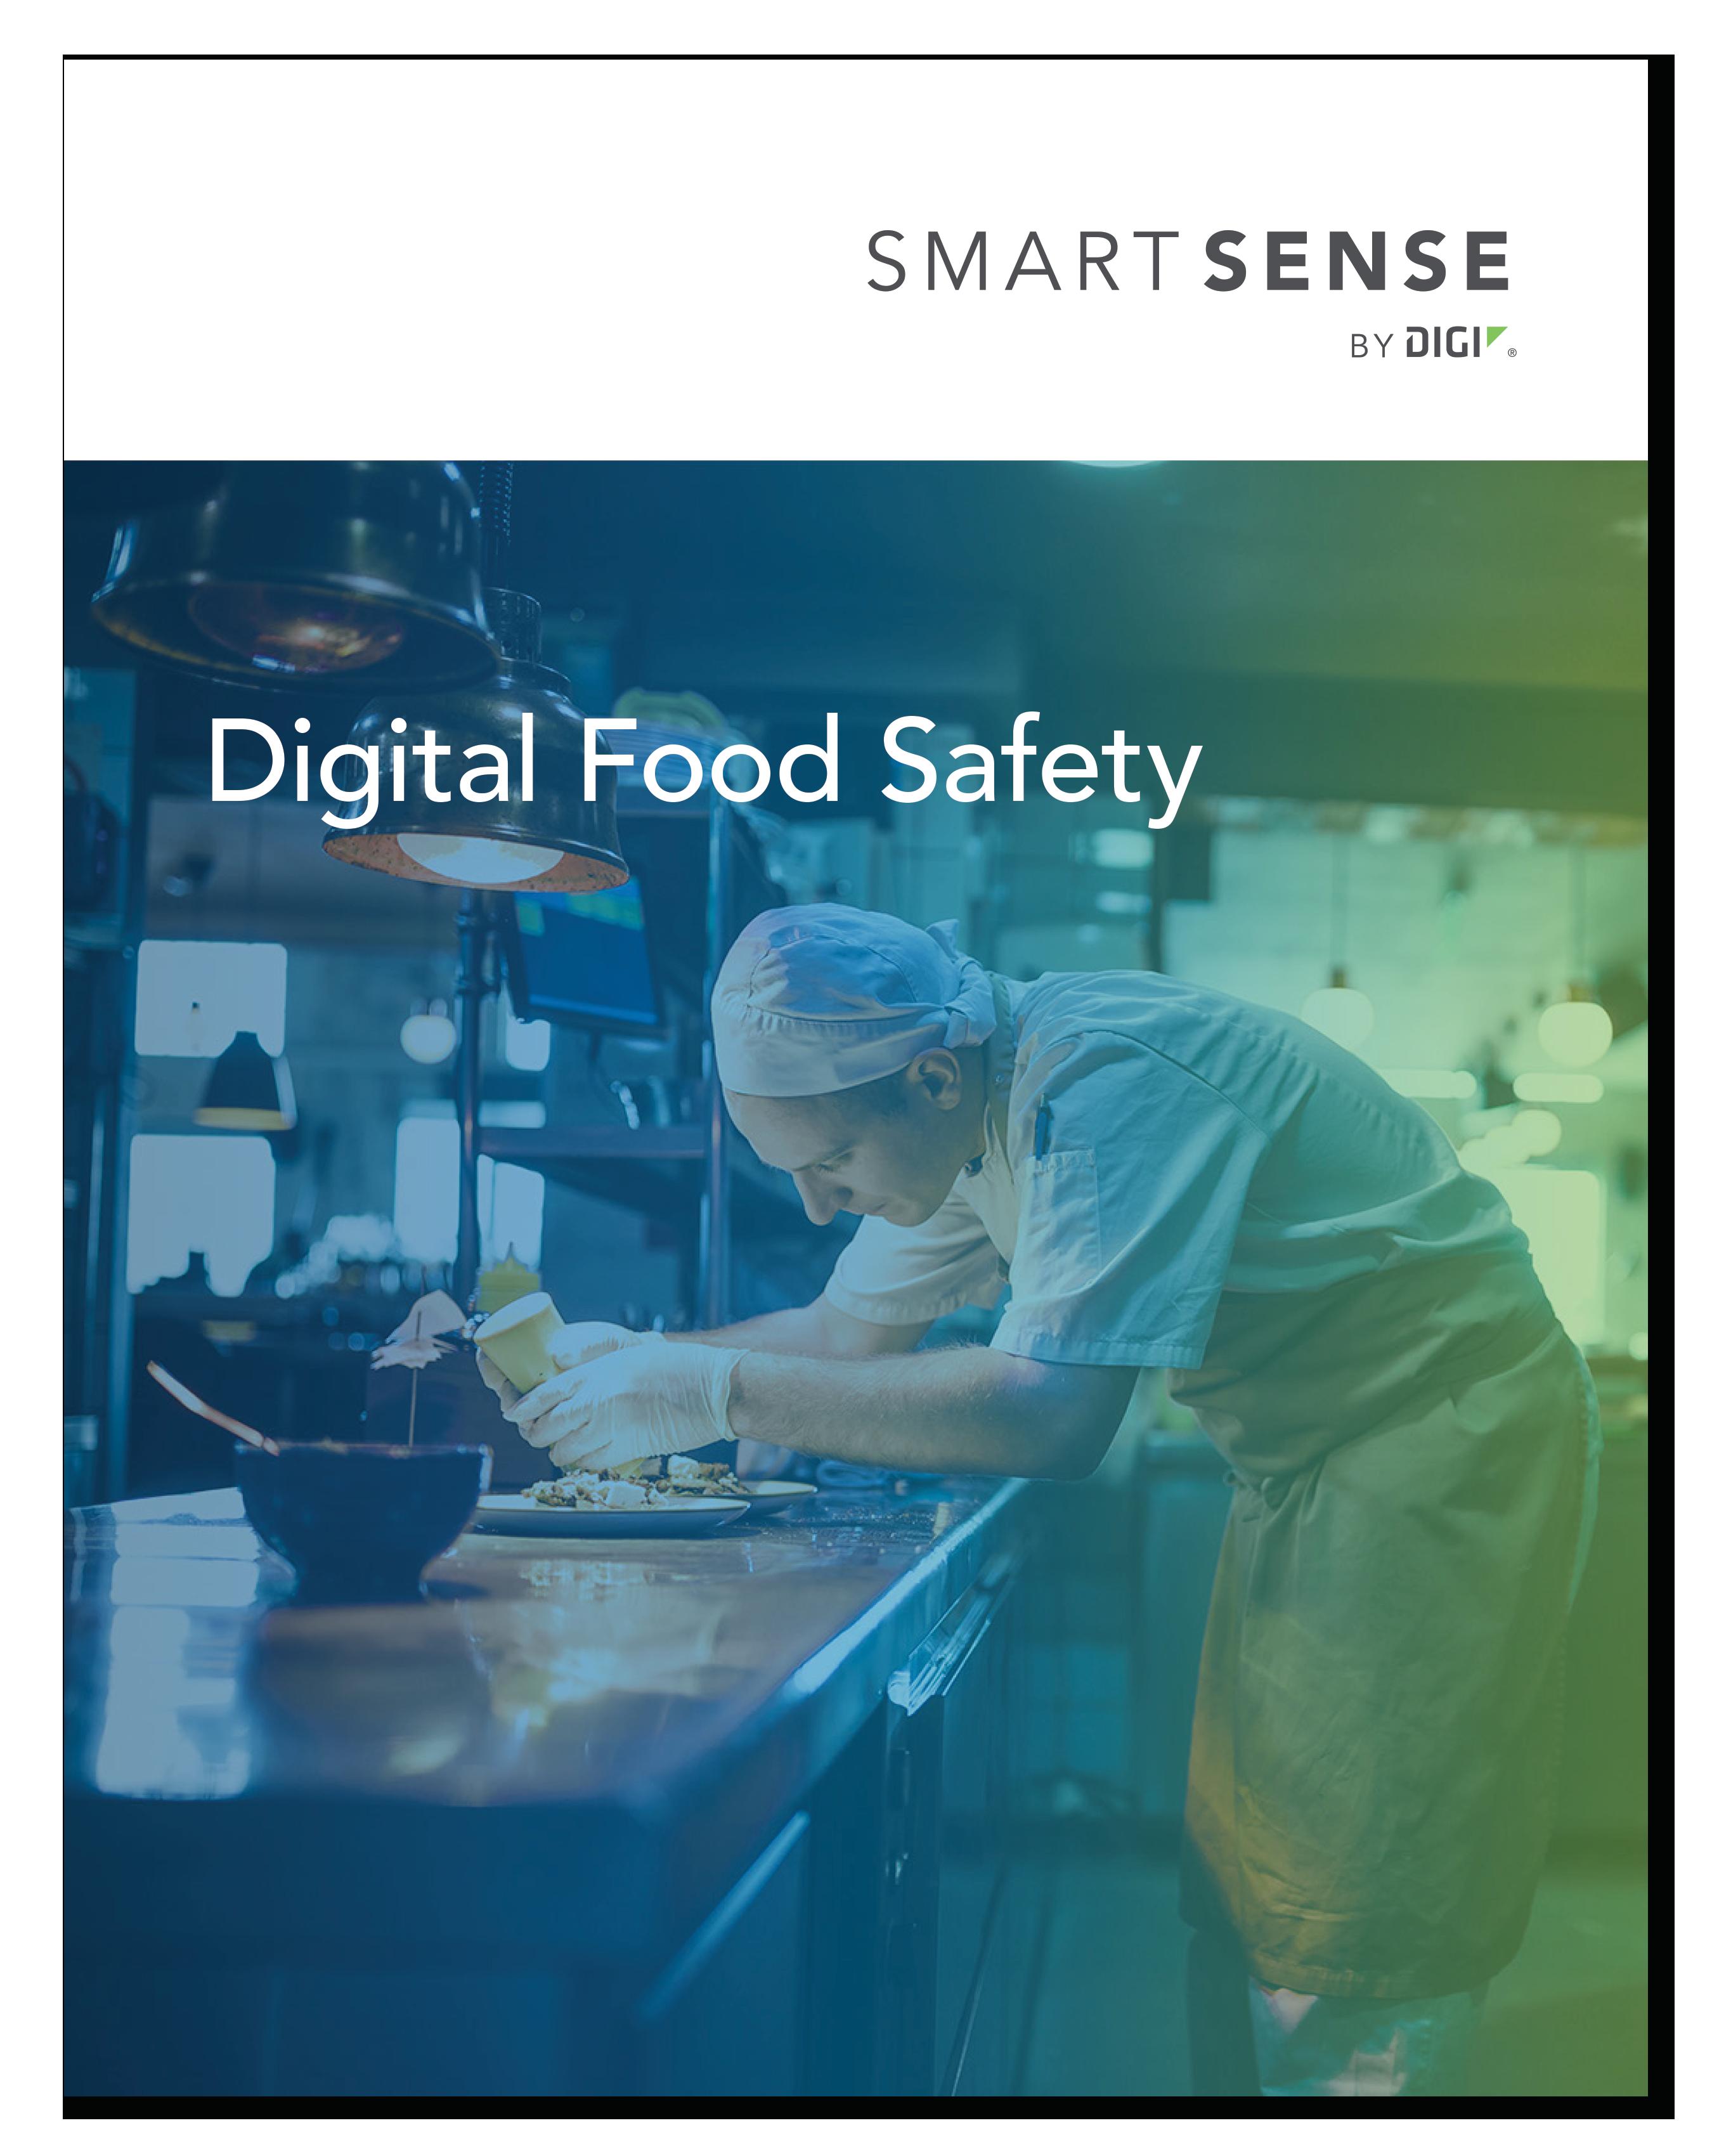 Digital Food Safety Brochure Thumbnail